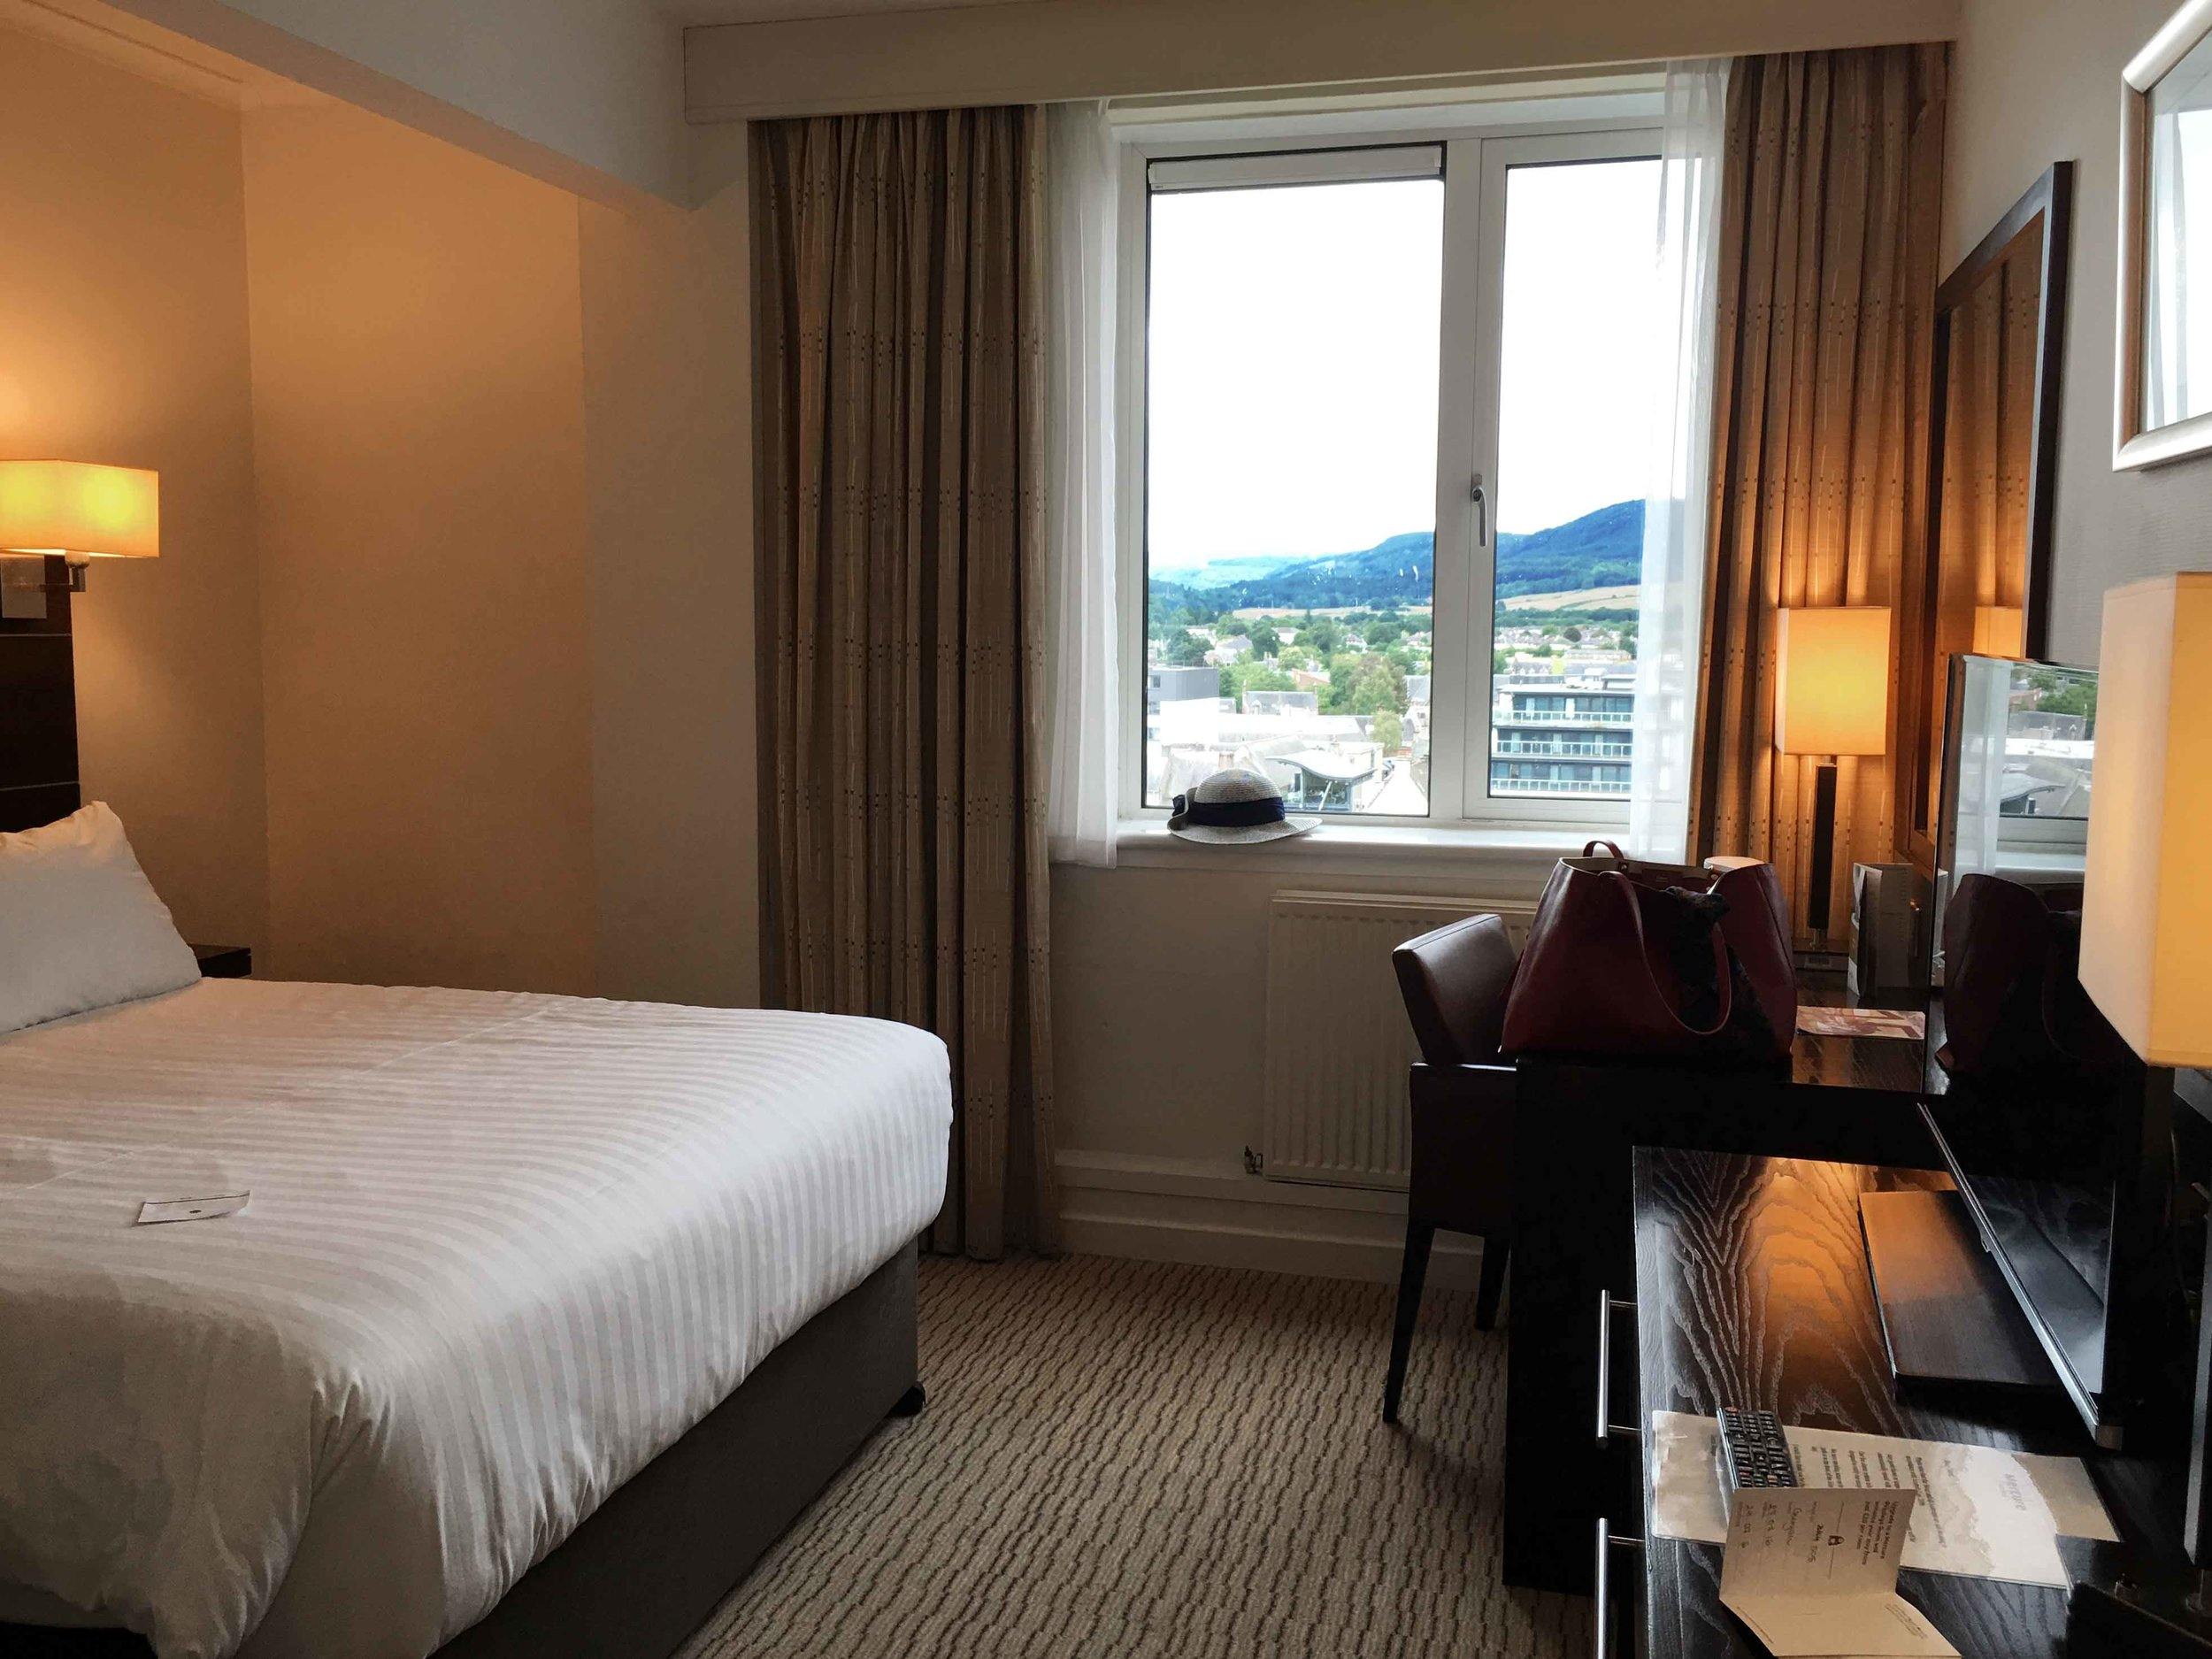 Mercure Inverness hotel, Inverness, Scotland. Image©sourcingstyle.com